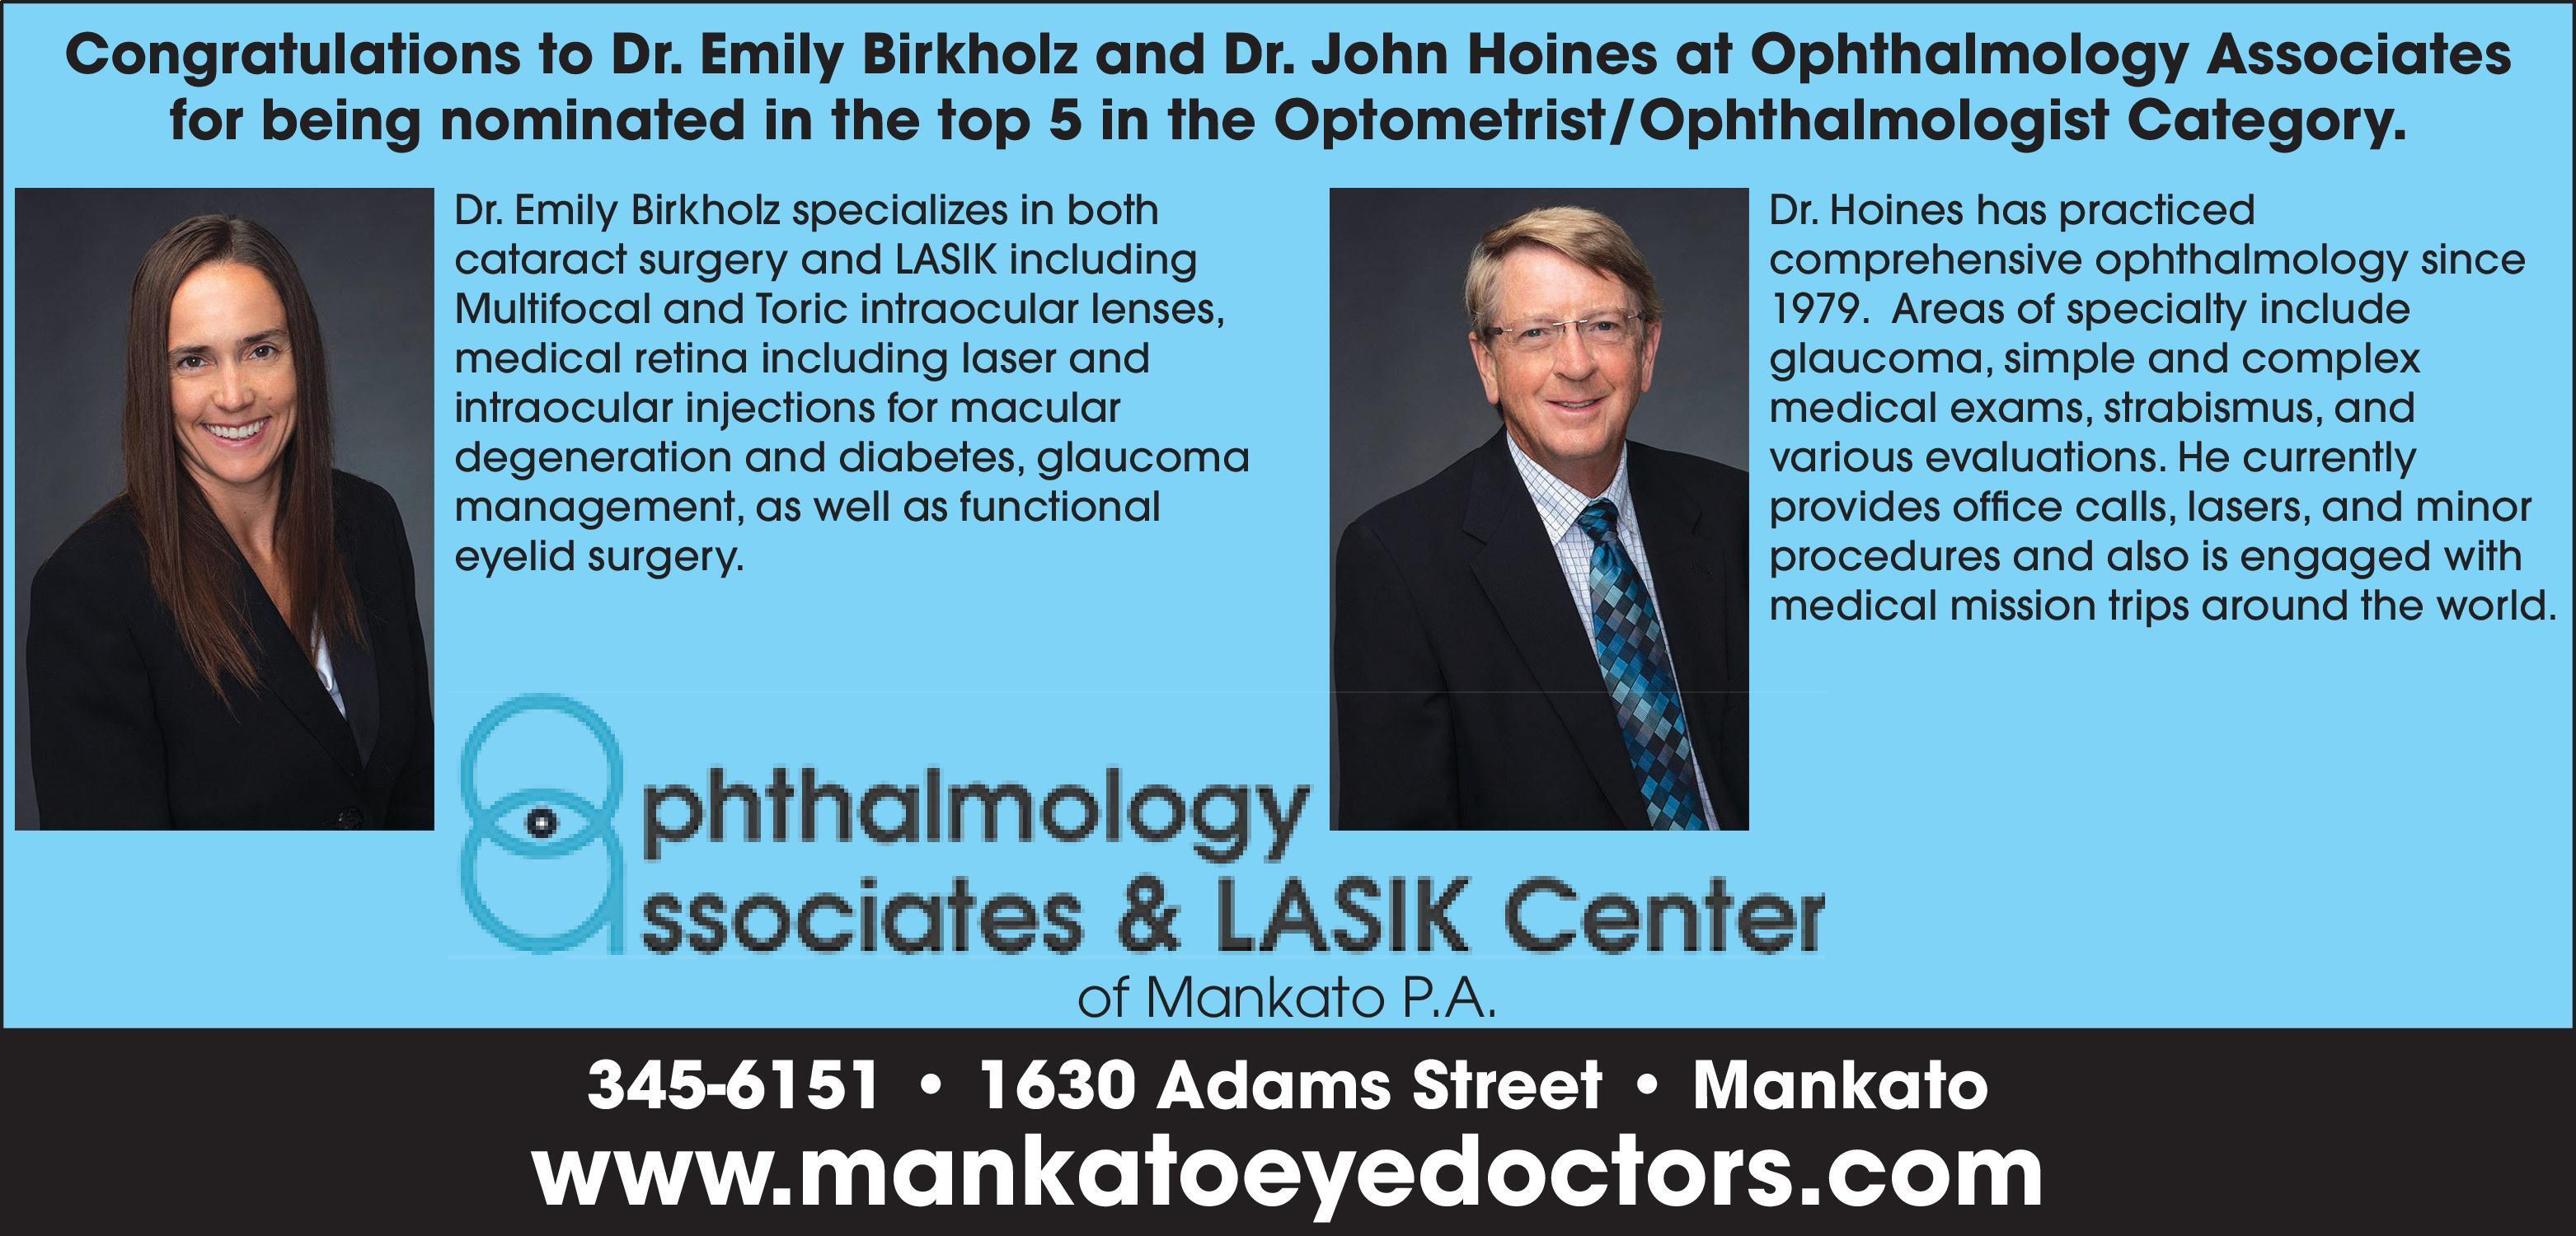 Ophthalmology Associates & LASIK Center of Mankato PA